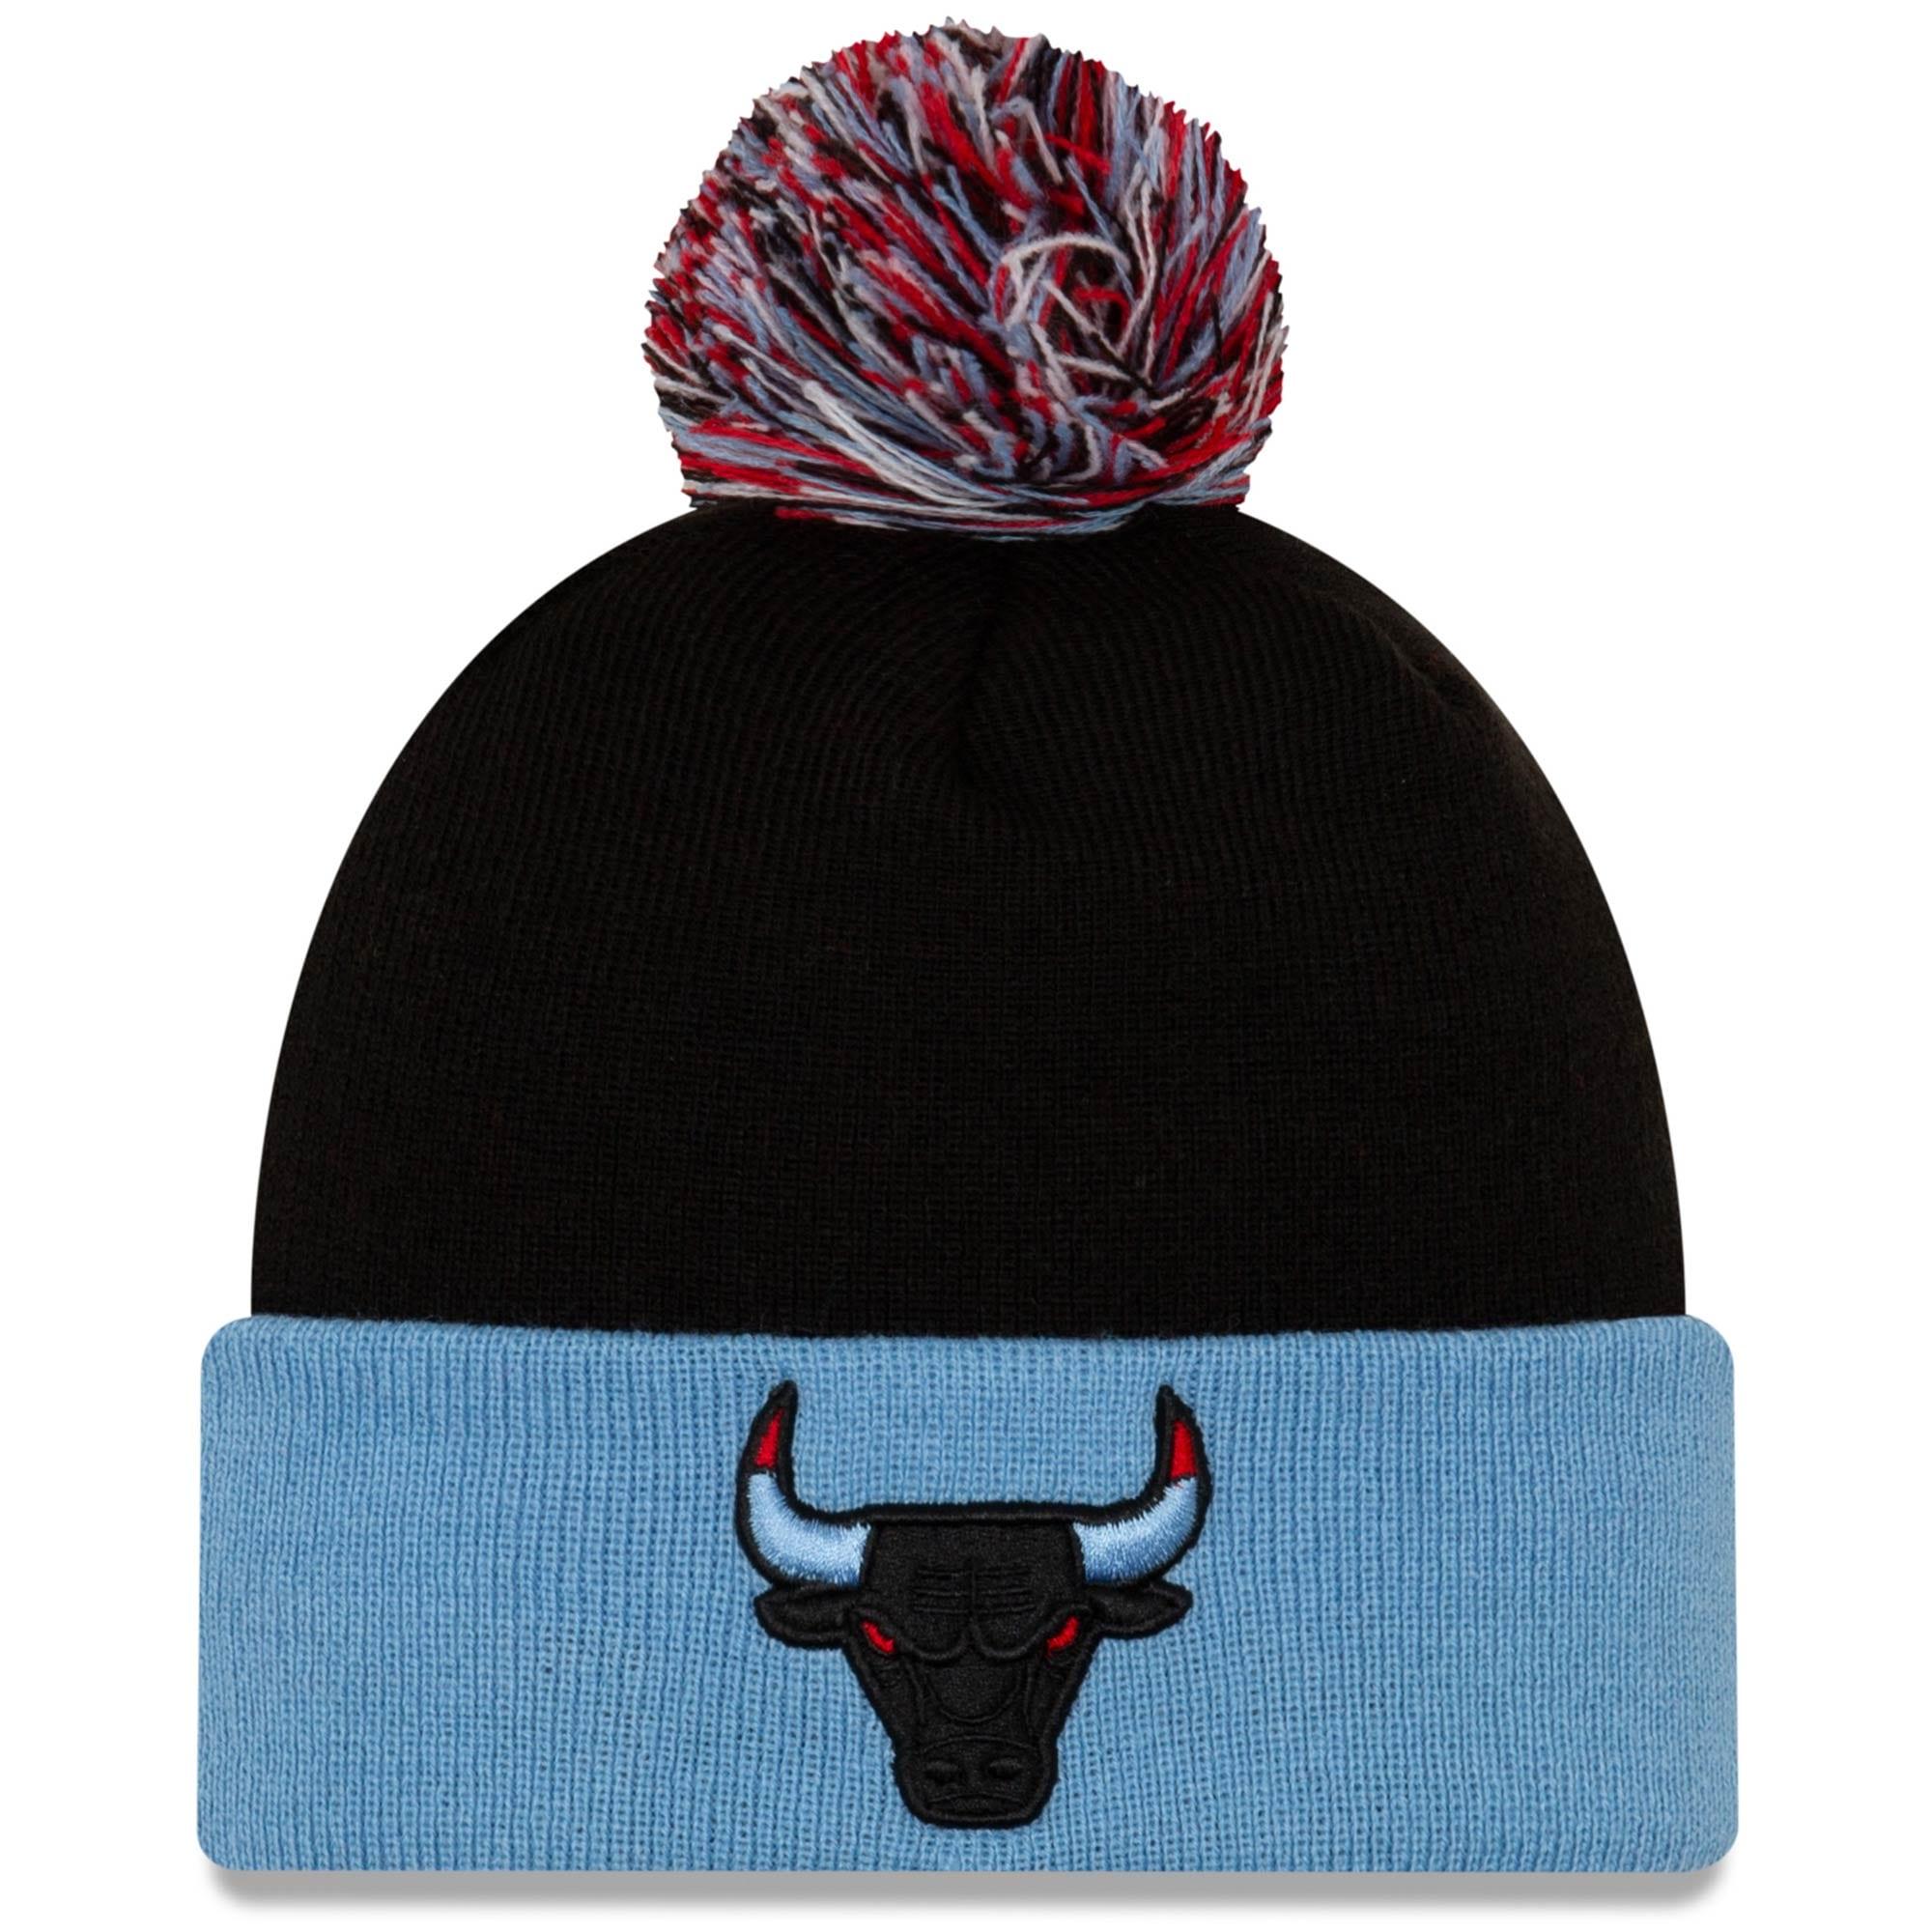 Chicago Bulls New Era Cuffed Knit Hat with Pom - Black/Light Blue